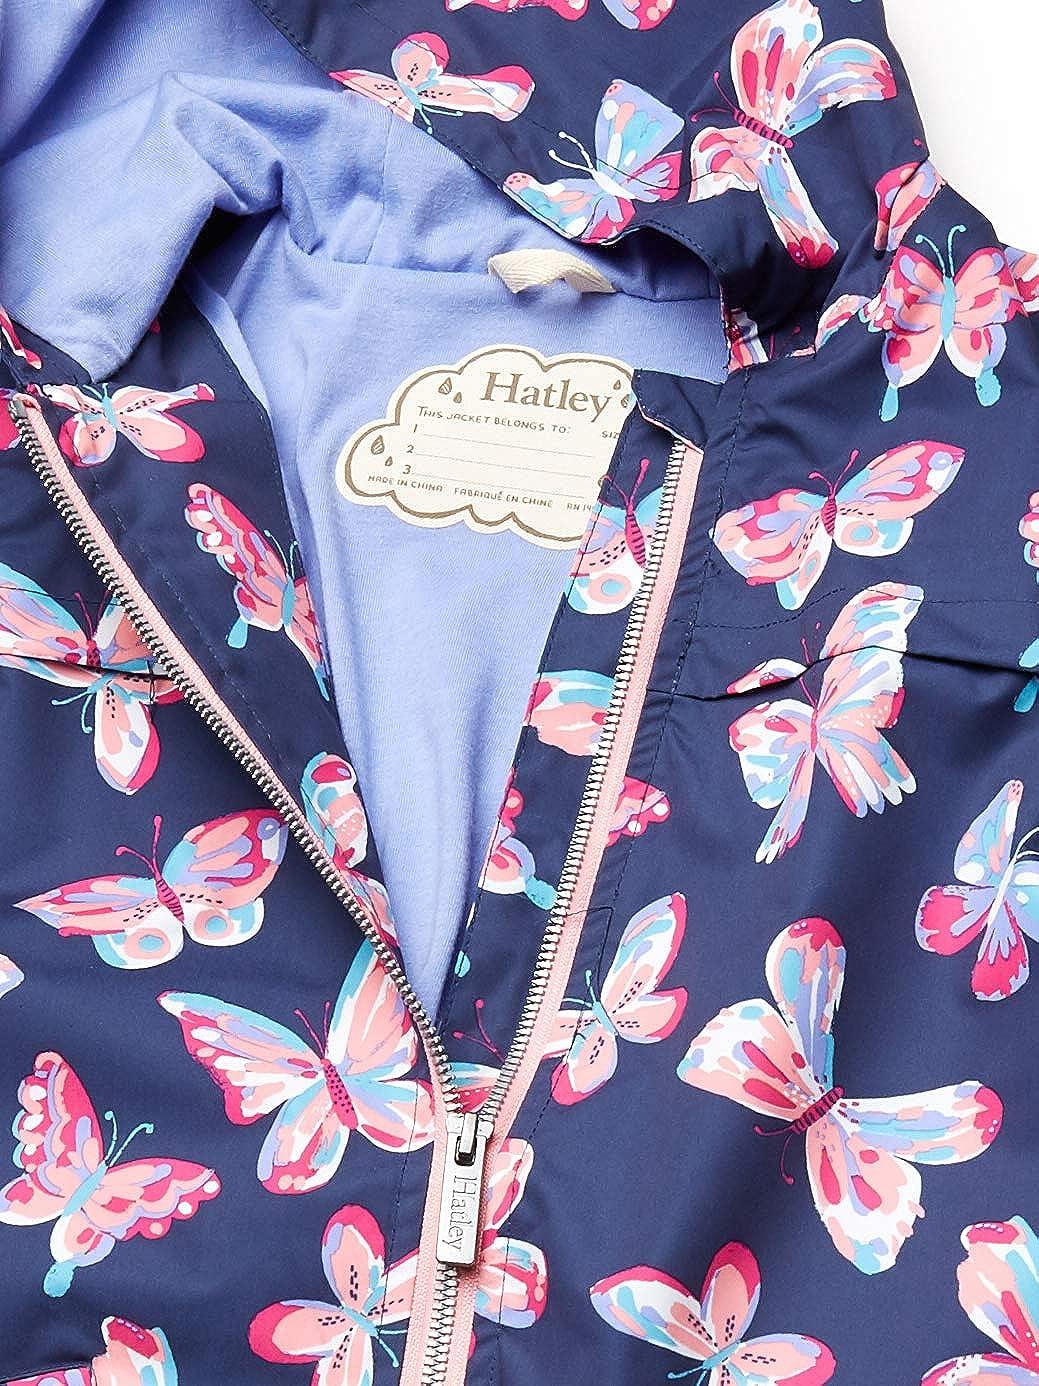 Hatley Girls Microfiber Rain Jackets